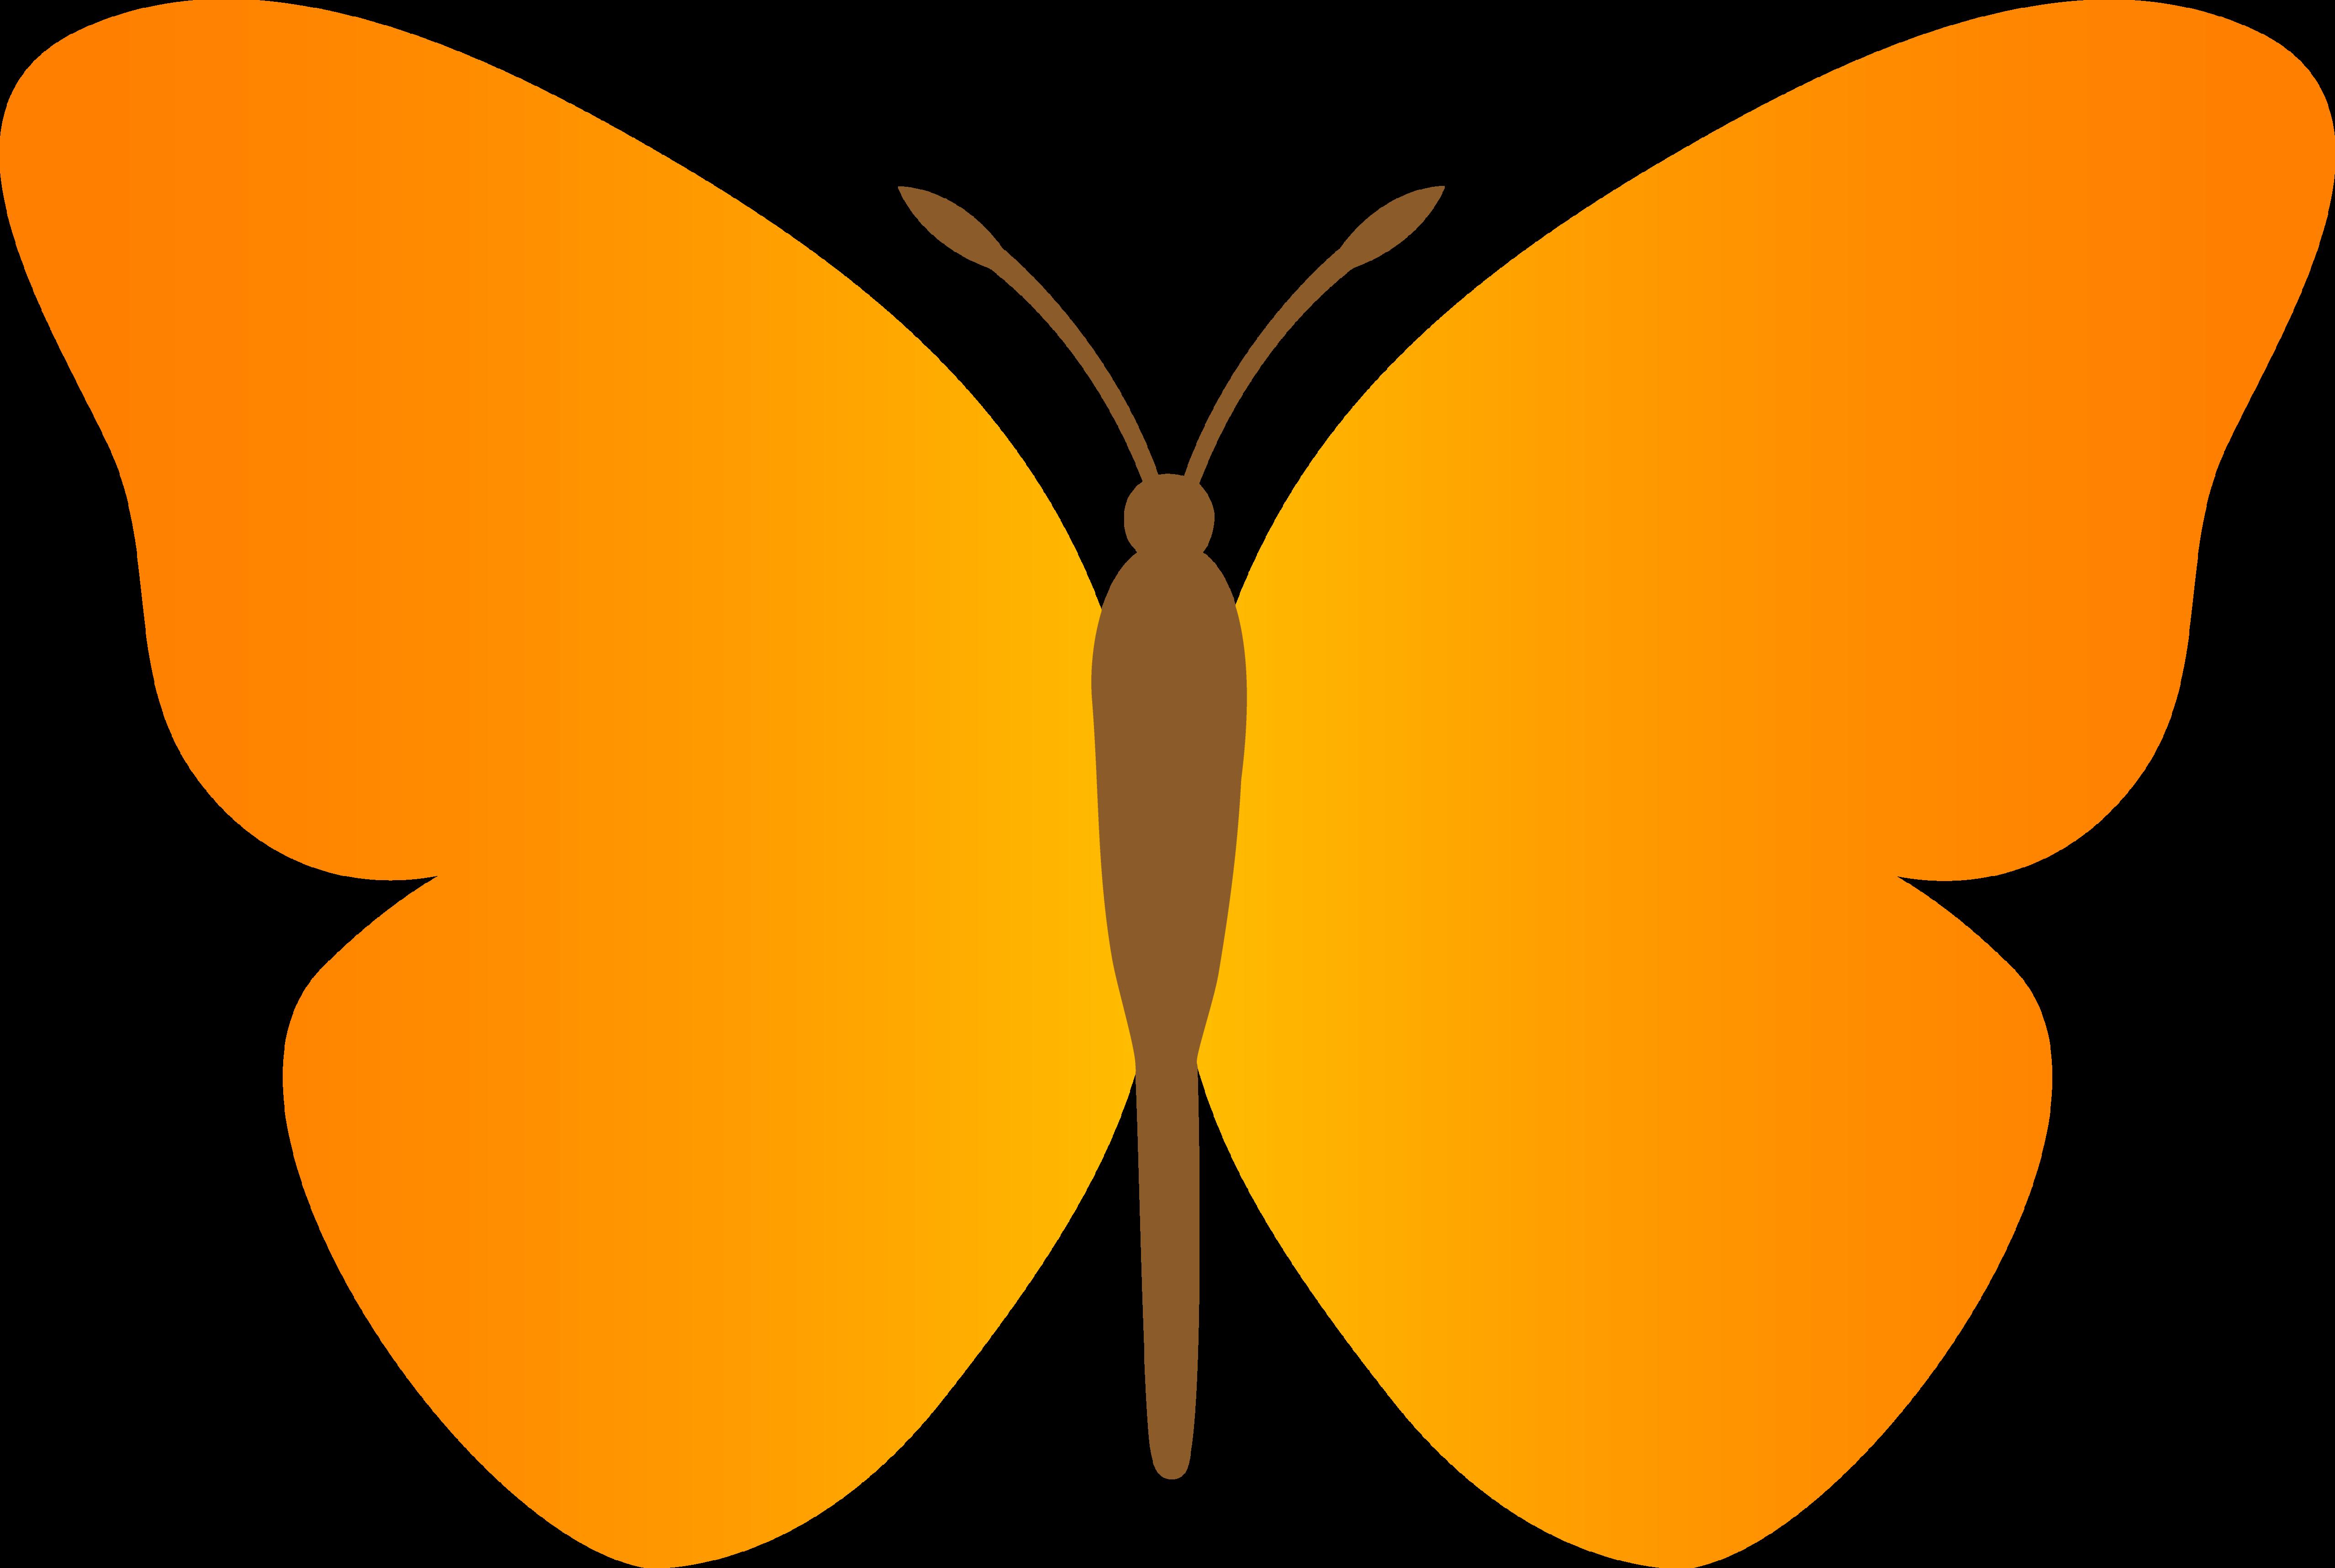 Gown clipart butterfly Butterfly Butterfly 3 Clipart #9492